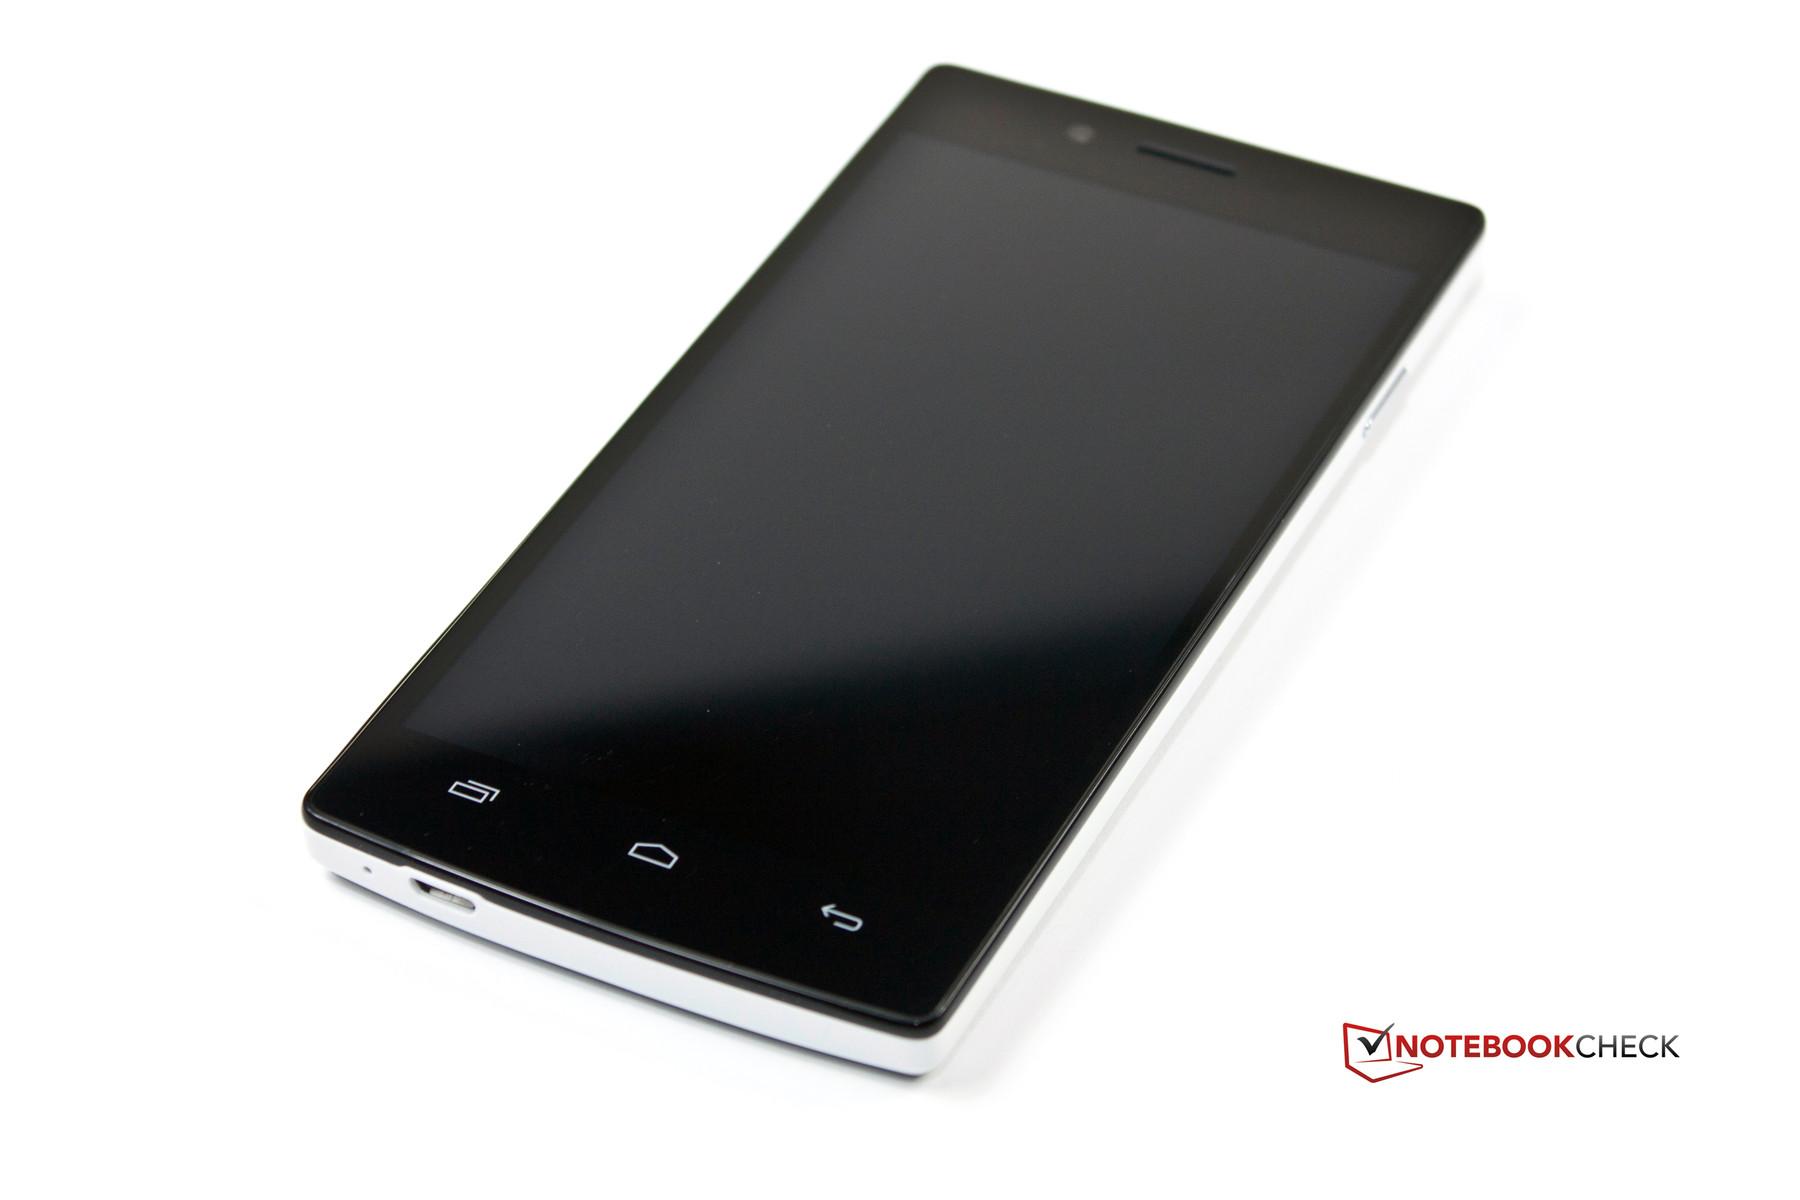 IOcean-X7-Elite-2-Gb-RAM-32-Gb-ROM-50-pulgadas-FHD-1080p-1920-x-1080px-1.5GHz-quad-core-Android-4.2-Smartphone-8MP-cámara-frontal-13MP-cámara-trasera-Gris-Blanco-2